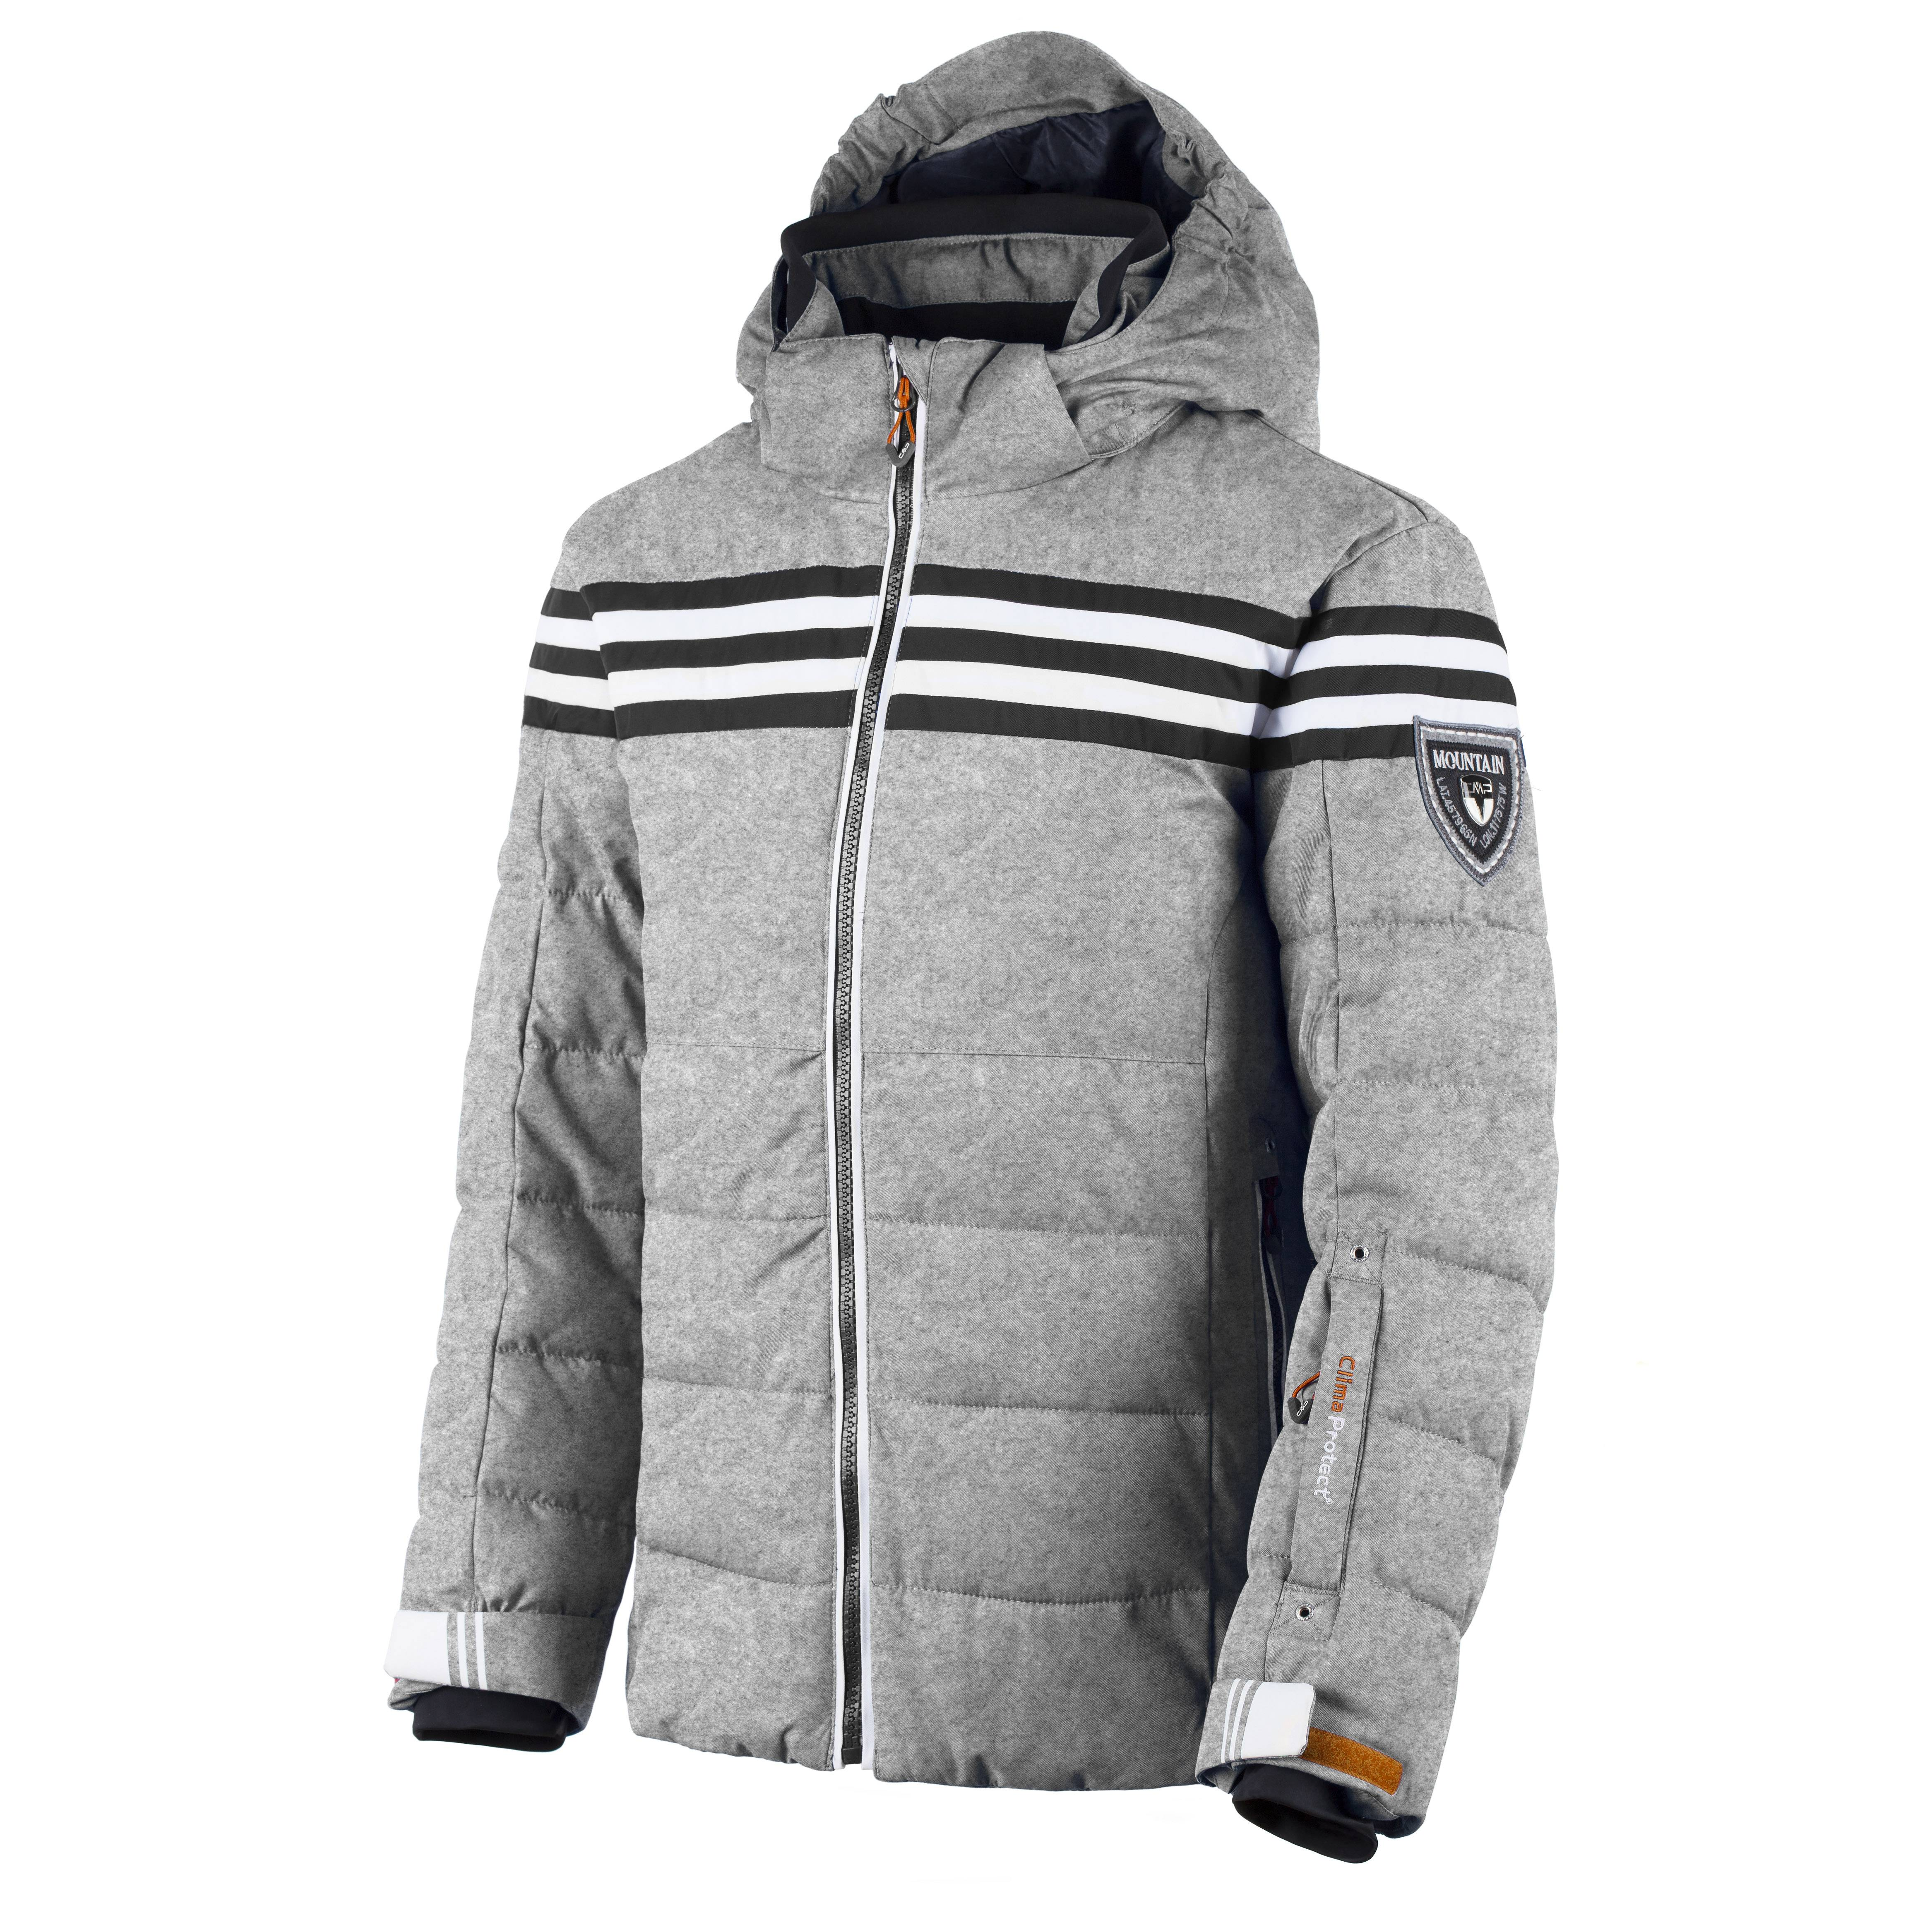 CMP-Chaqueta-de-snowboard-invierno-gris-impermeable-transpirable-abrigados